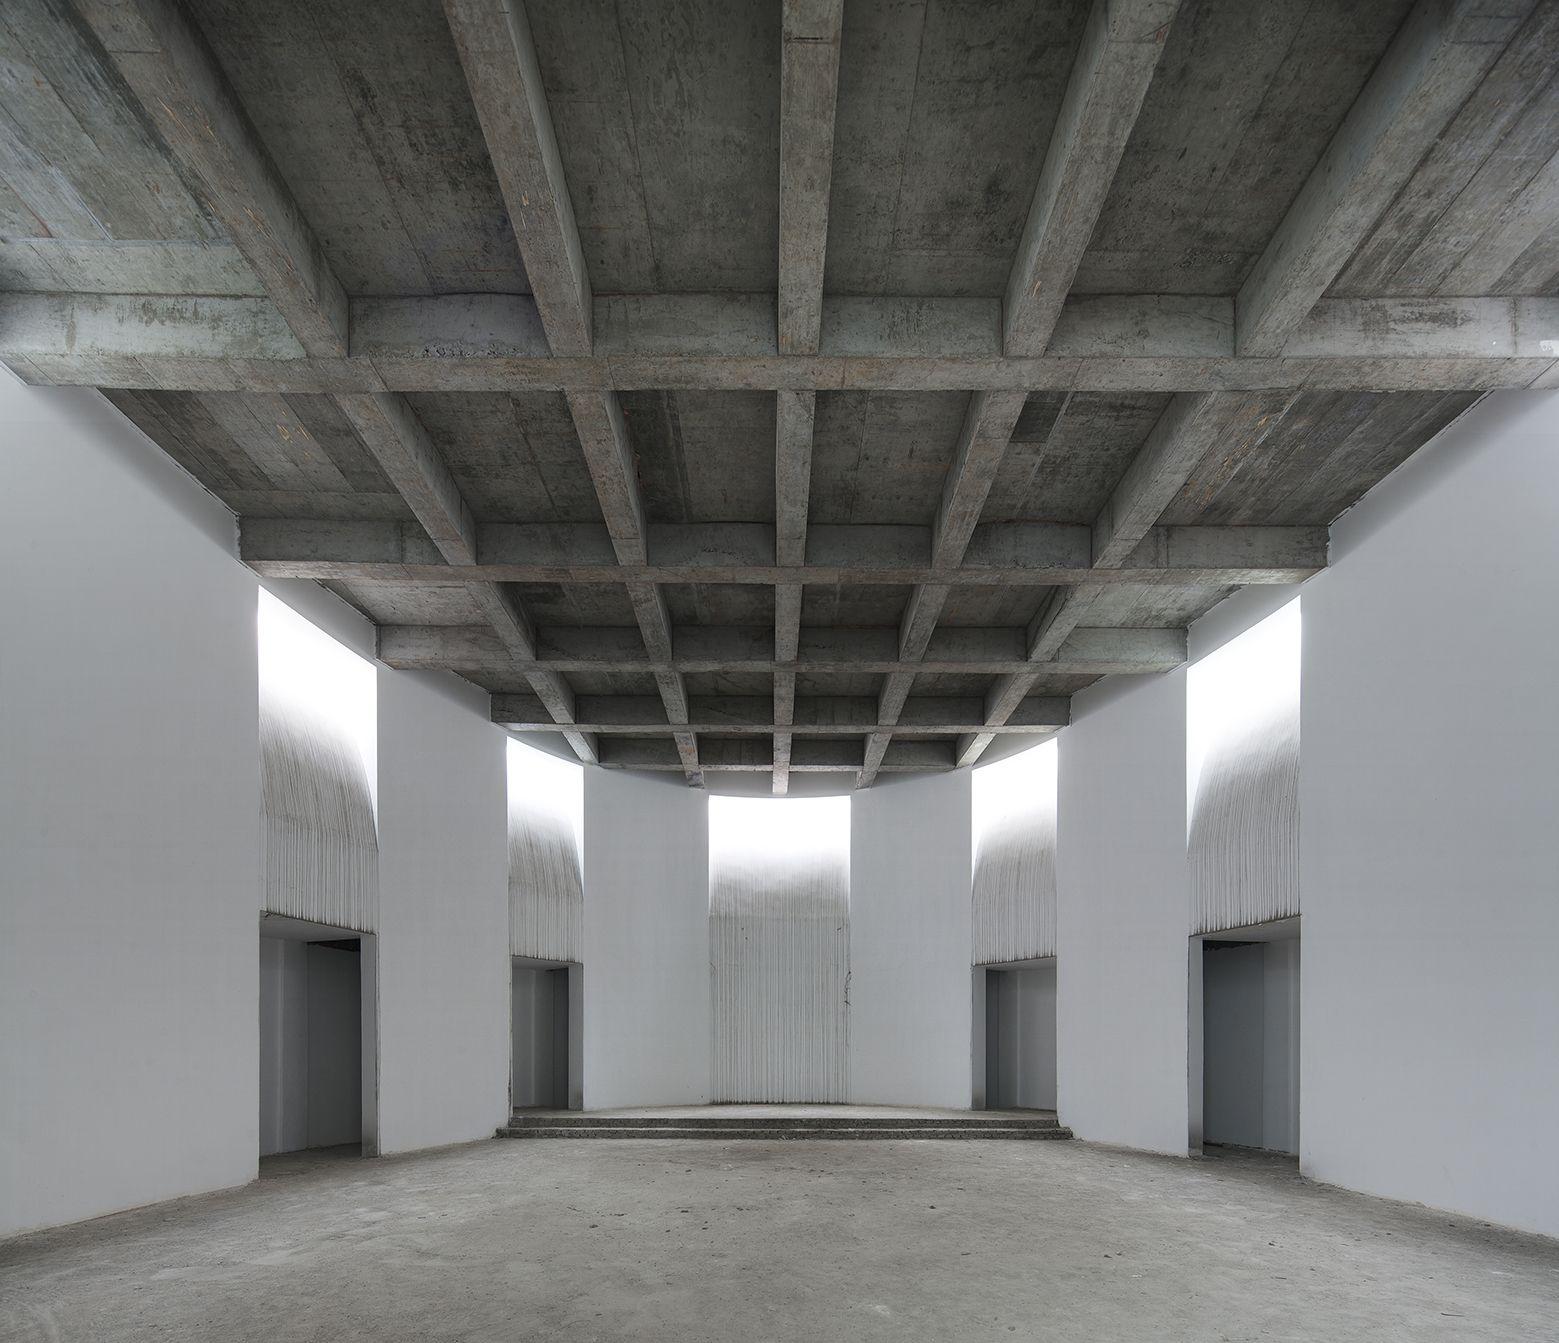 Galeria Arquitectonica: Galería De Iglesia Católica En Qichun / Leekostudio